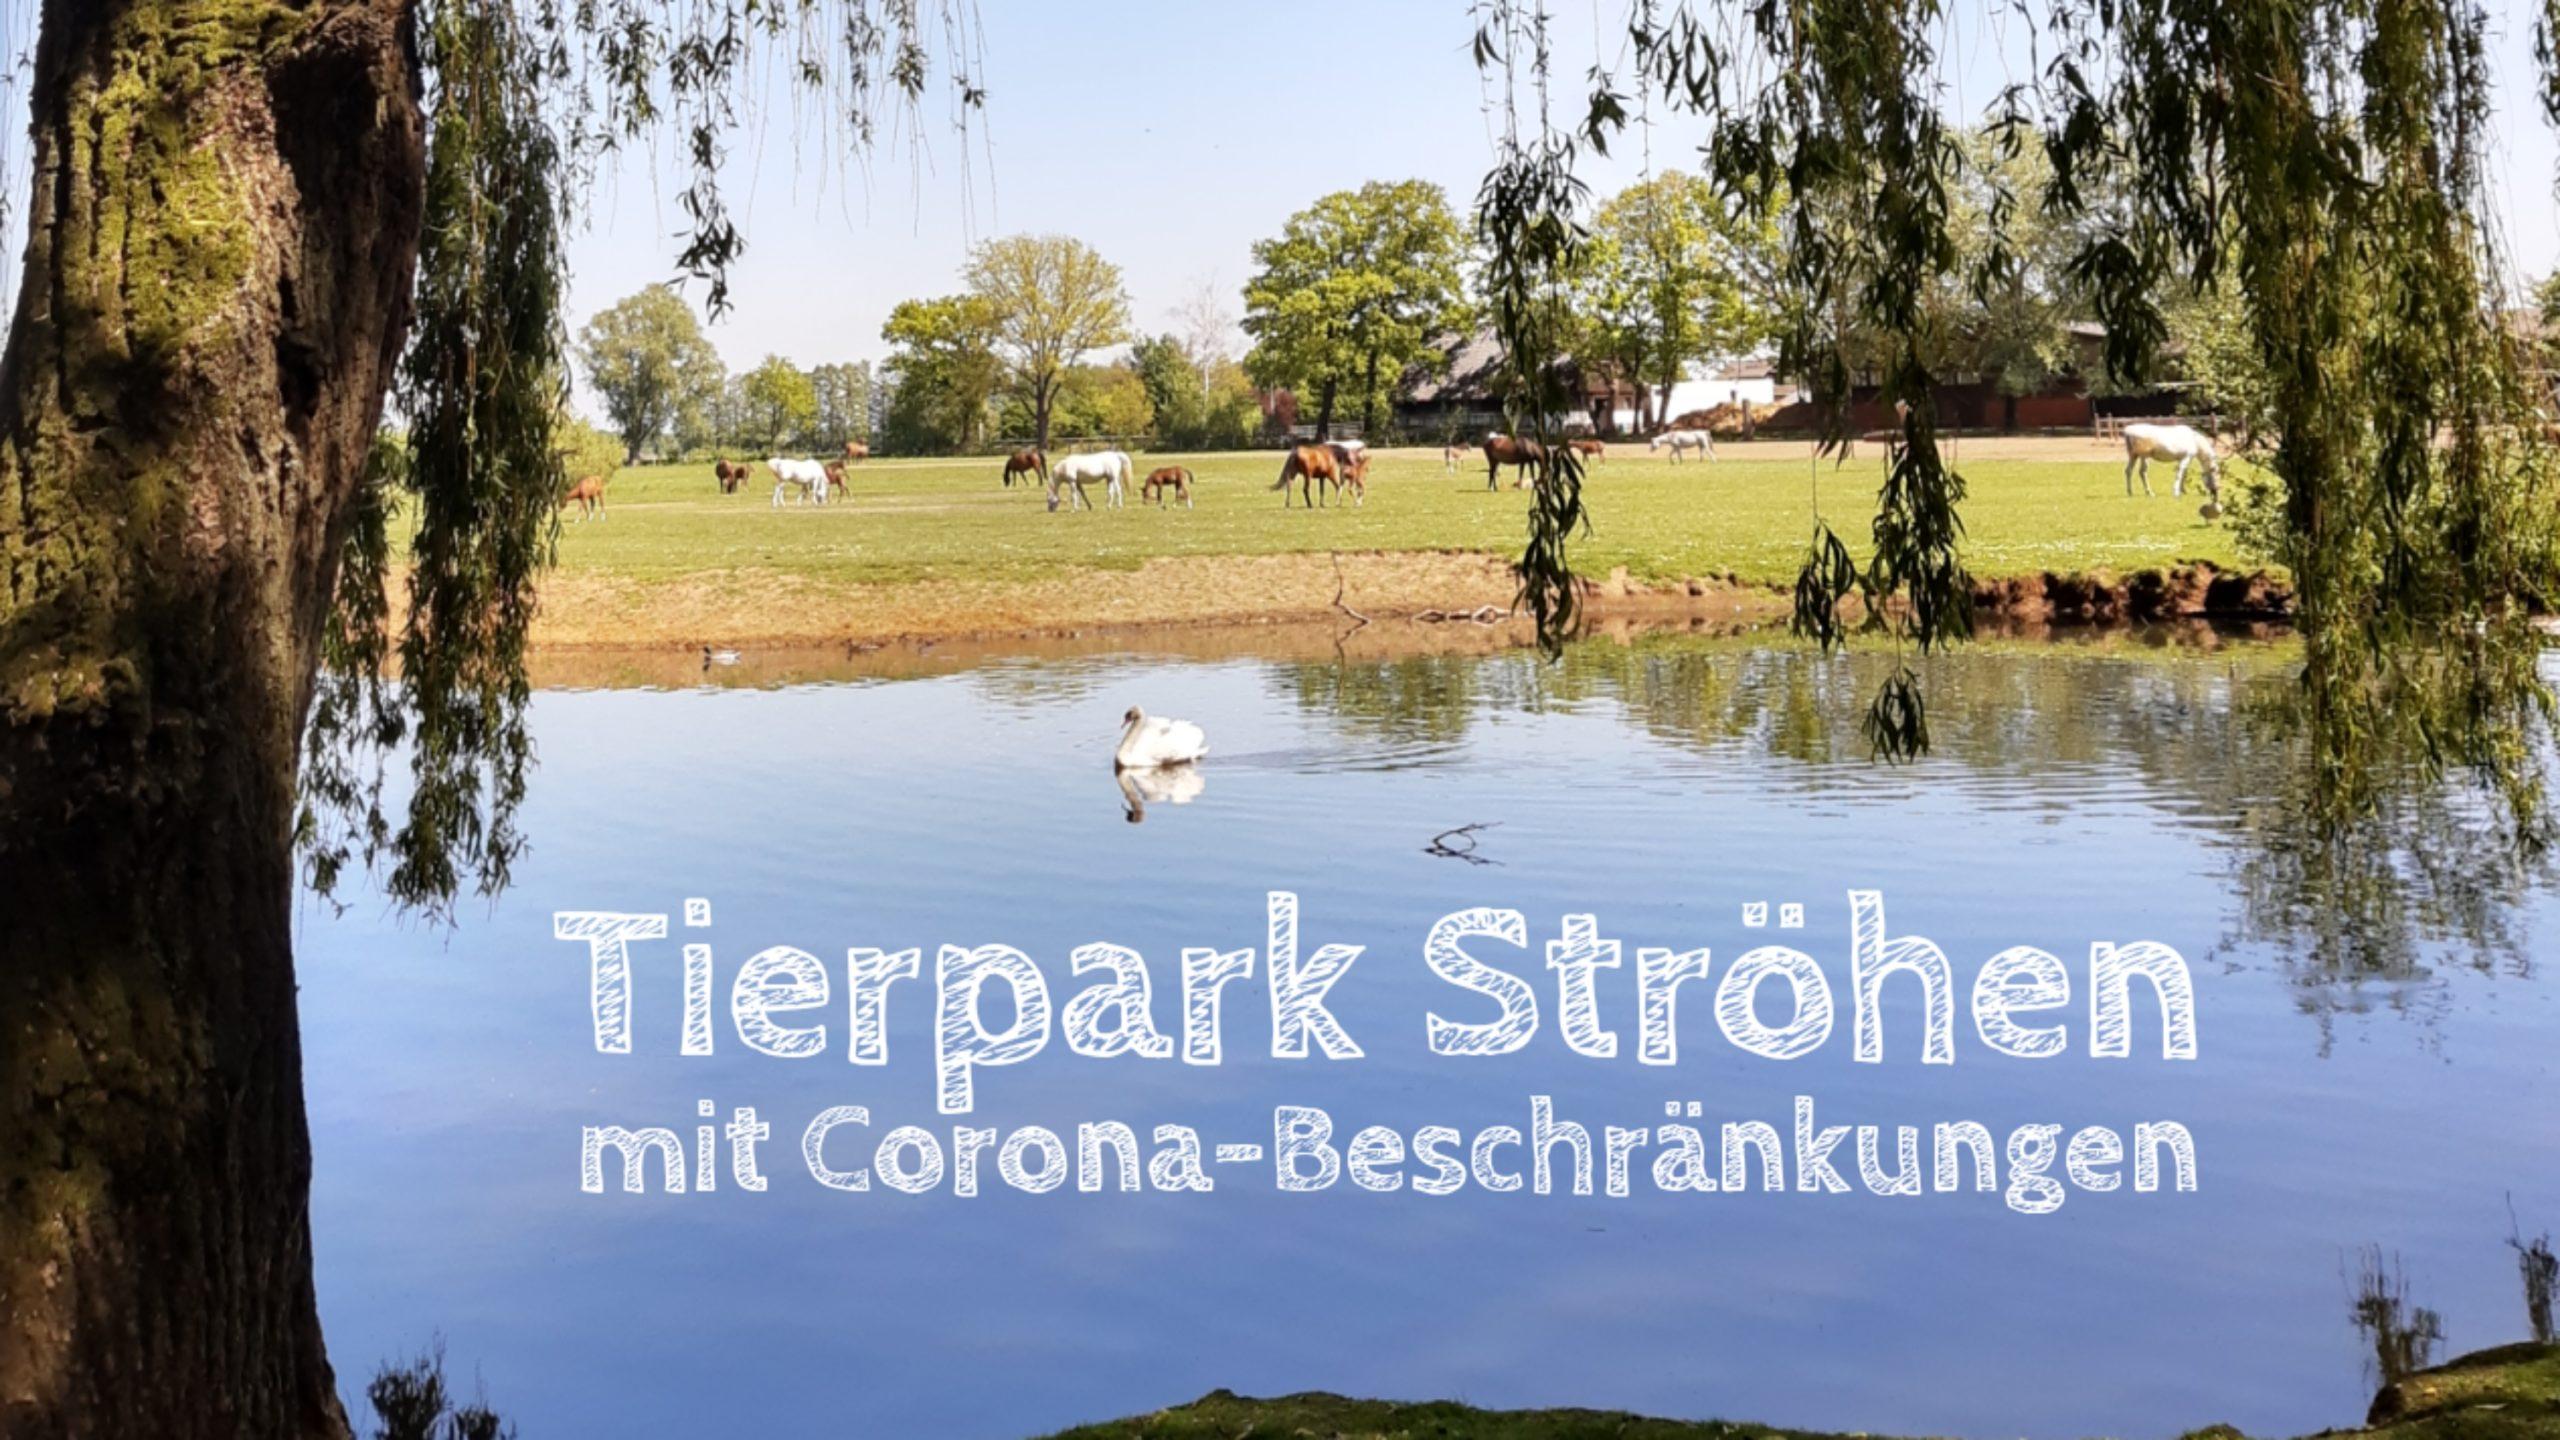 tierpark ströhen corona